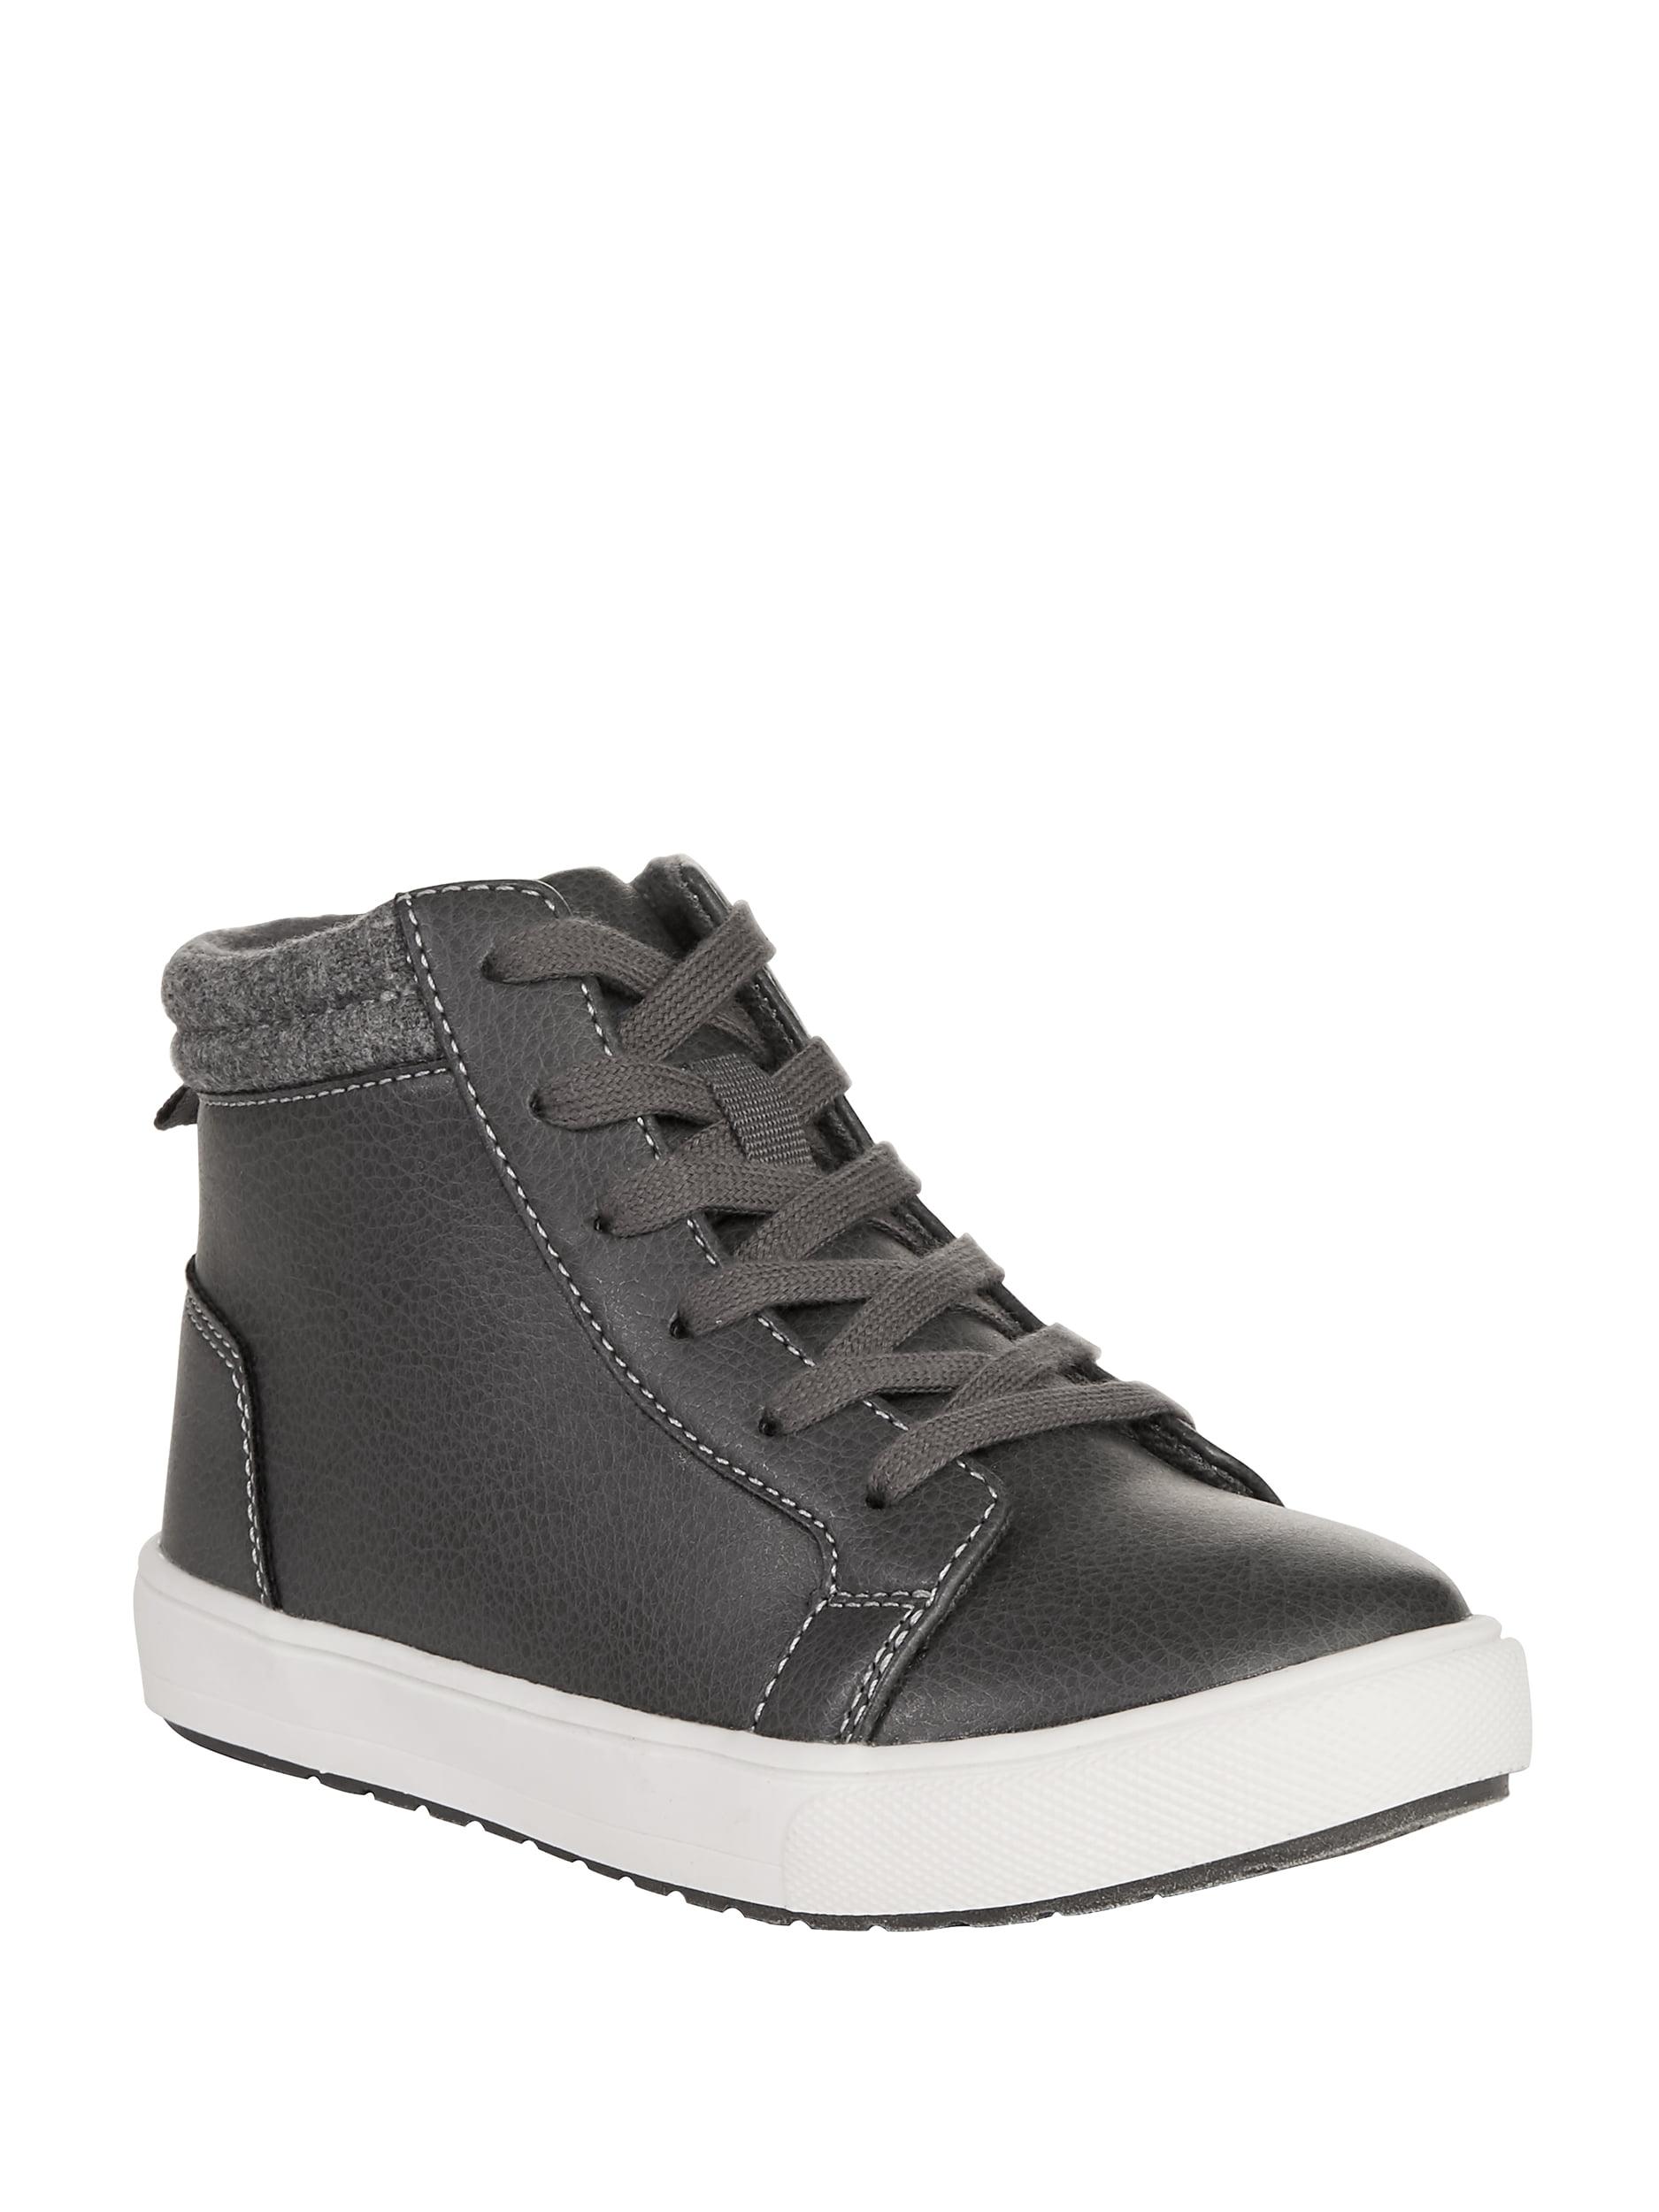 Black Size 1 M US Kids Kids Polo Ralph Lauren Boys Chett Leather Hight Top